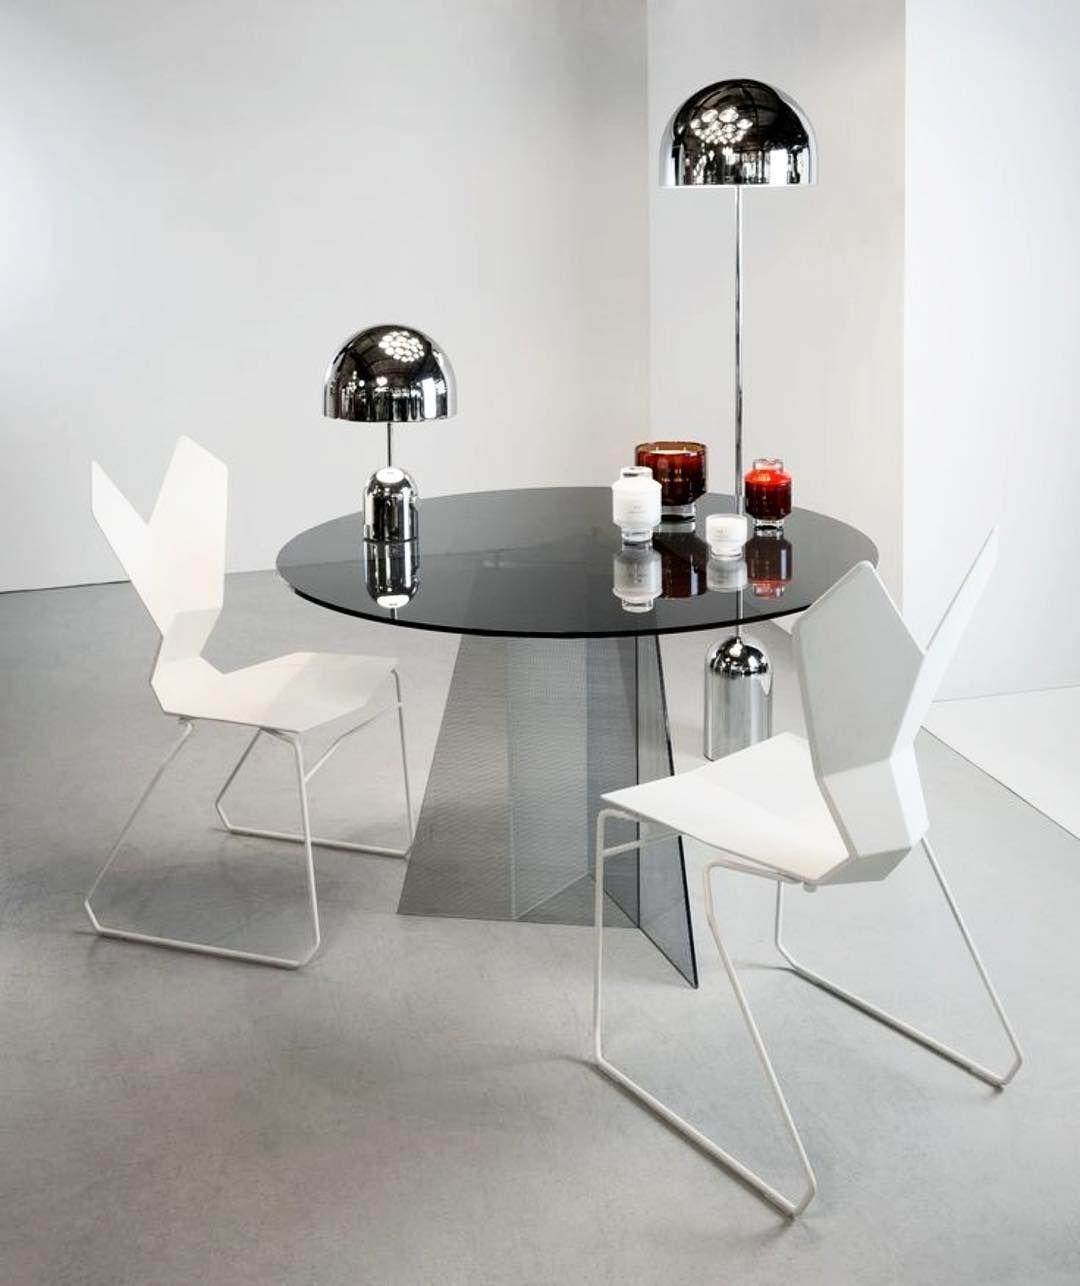 Y Chair u0026 Bell Light Tom Dixon u003e